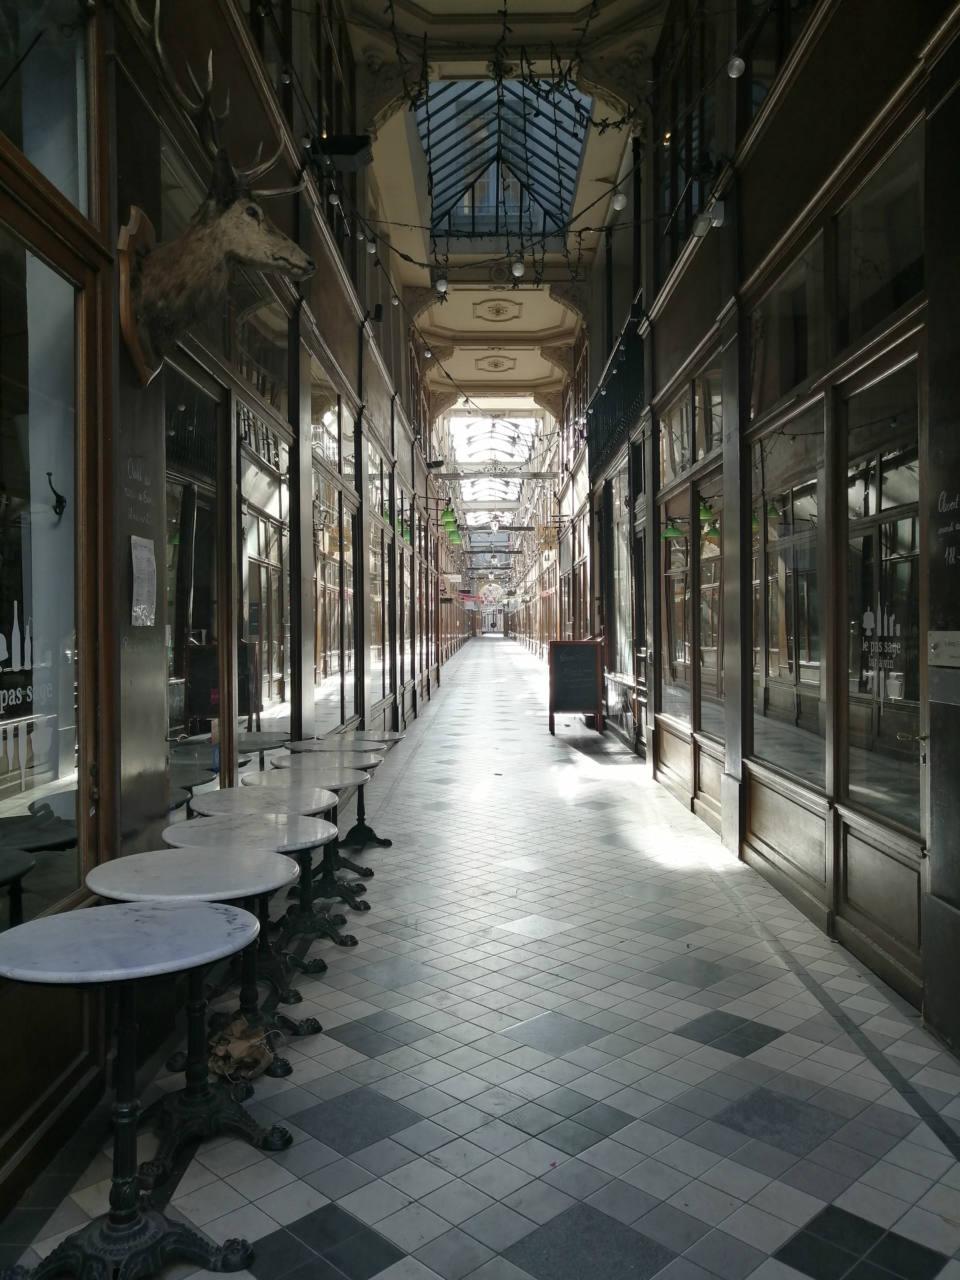 Parigi si prepara al coprifuoco